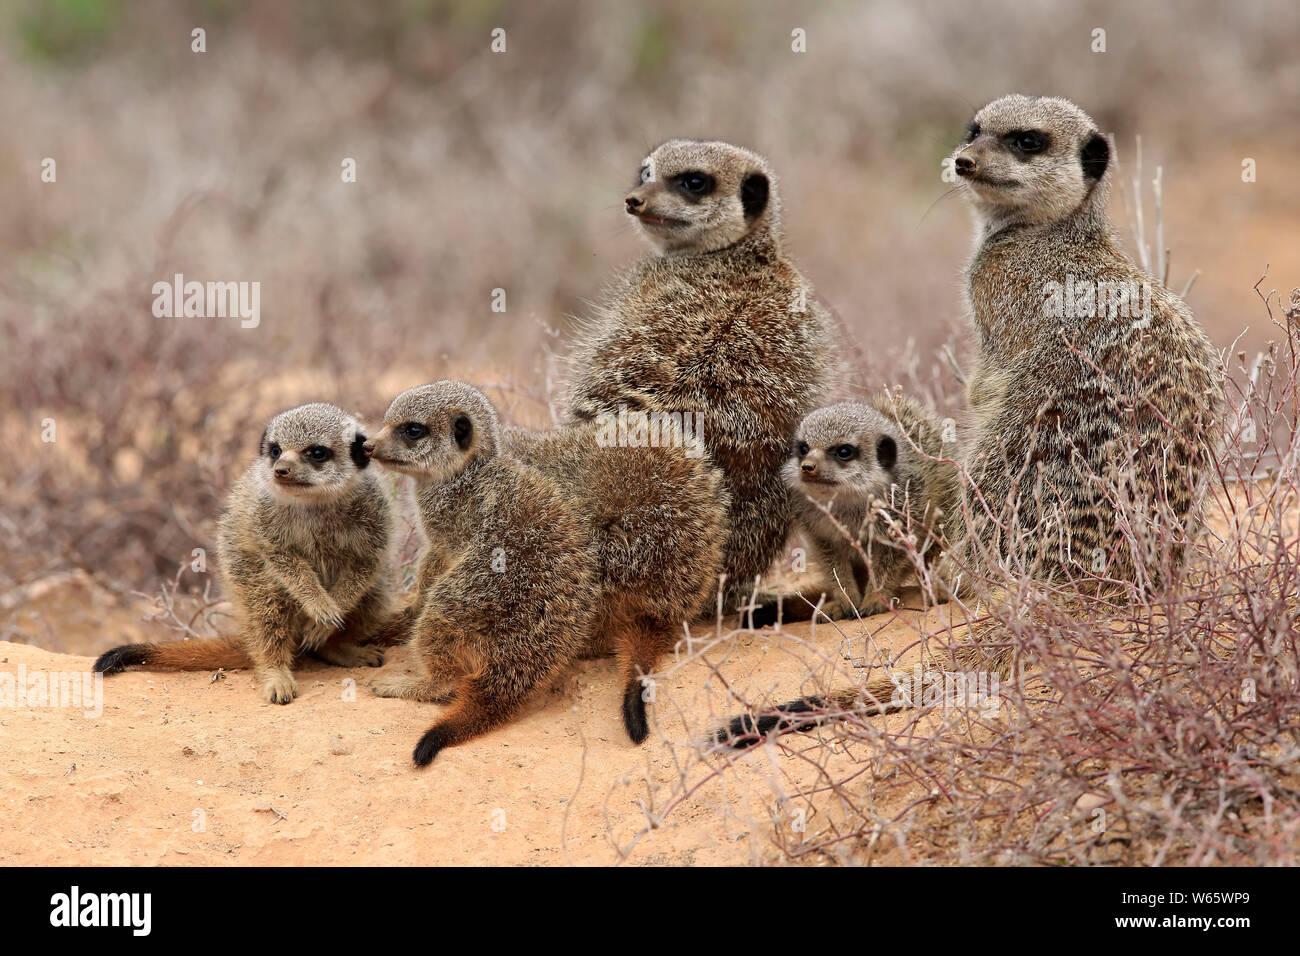 Suricate, Meerkat, adult with youngs, Oudtshoorn, Western Cape, South Africa, Africa, (Suricata suricatta) Stock Photo